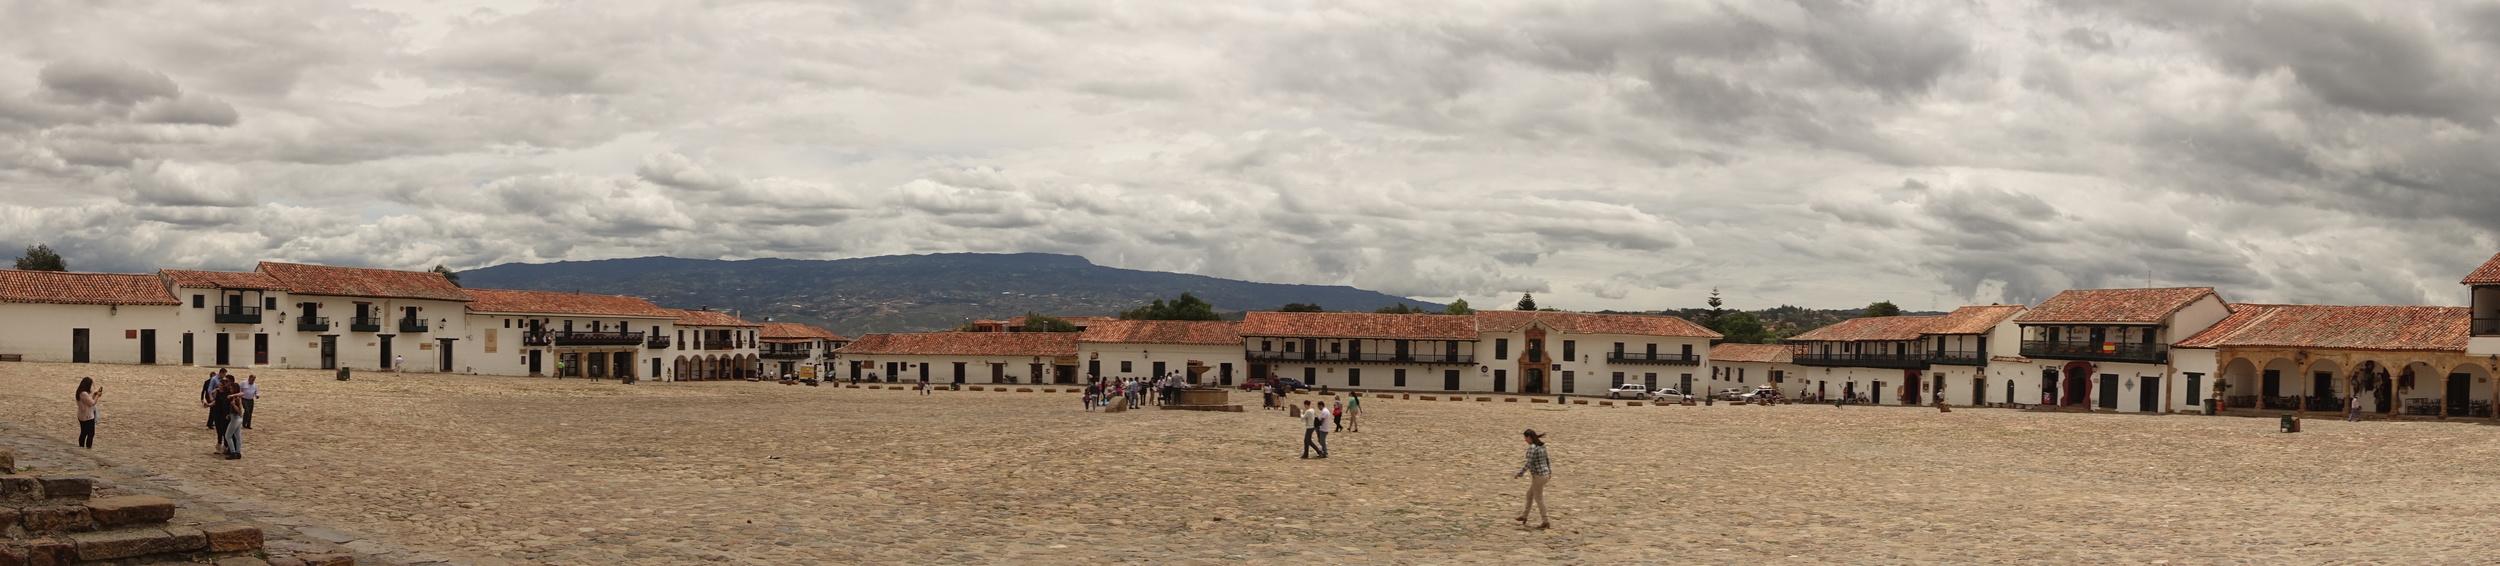 villa de leyva, central plaza